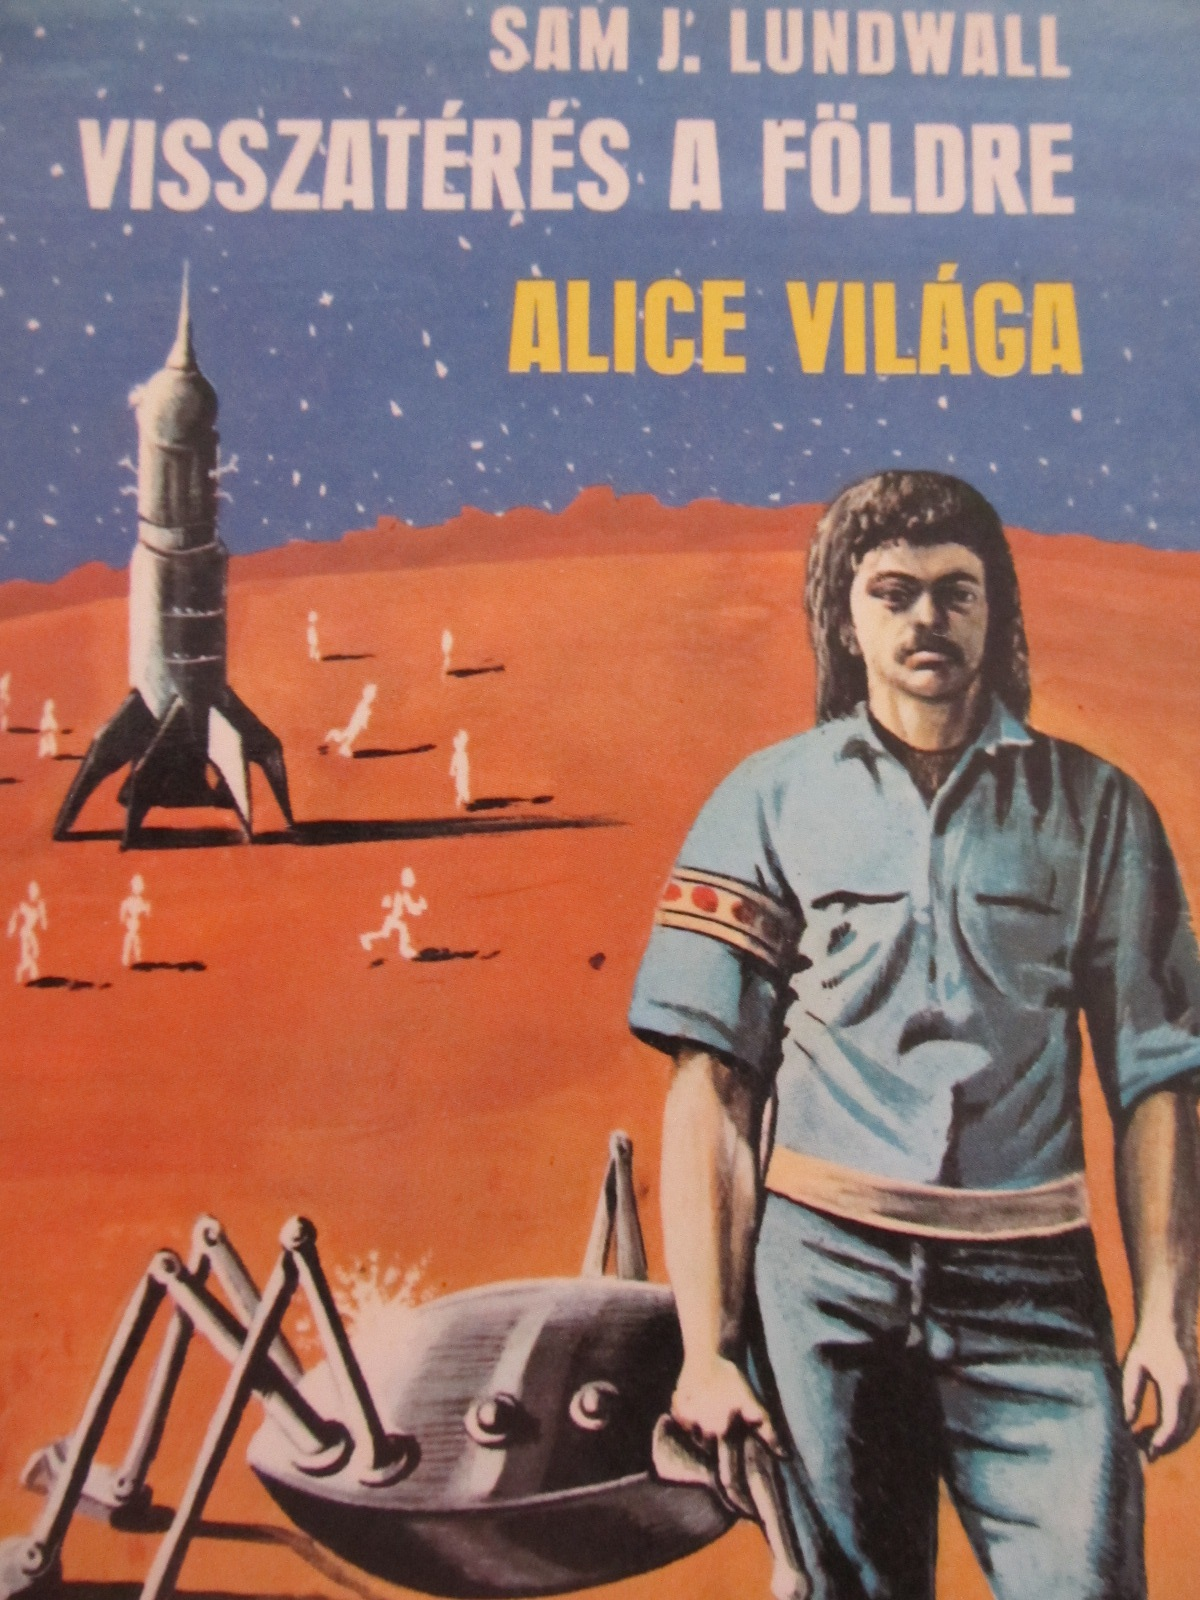 Visszateres a foldre - Alice vilaga - Sam J. Lundwall | Detalii carte